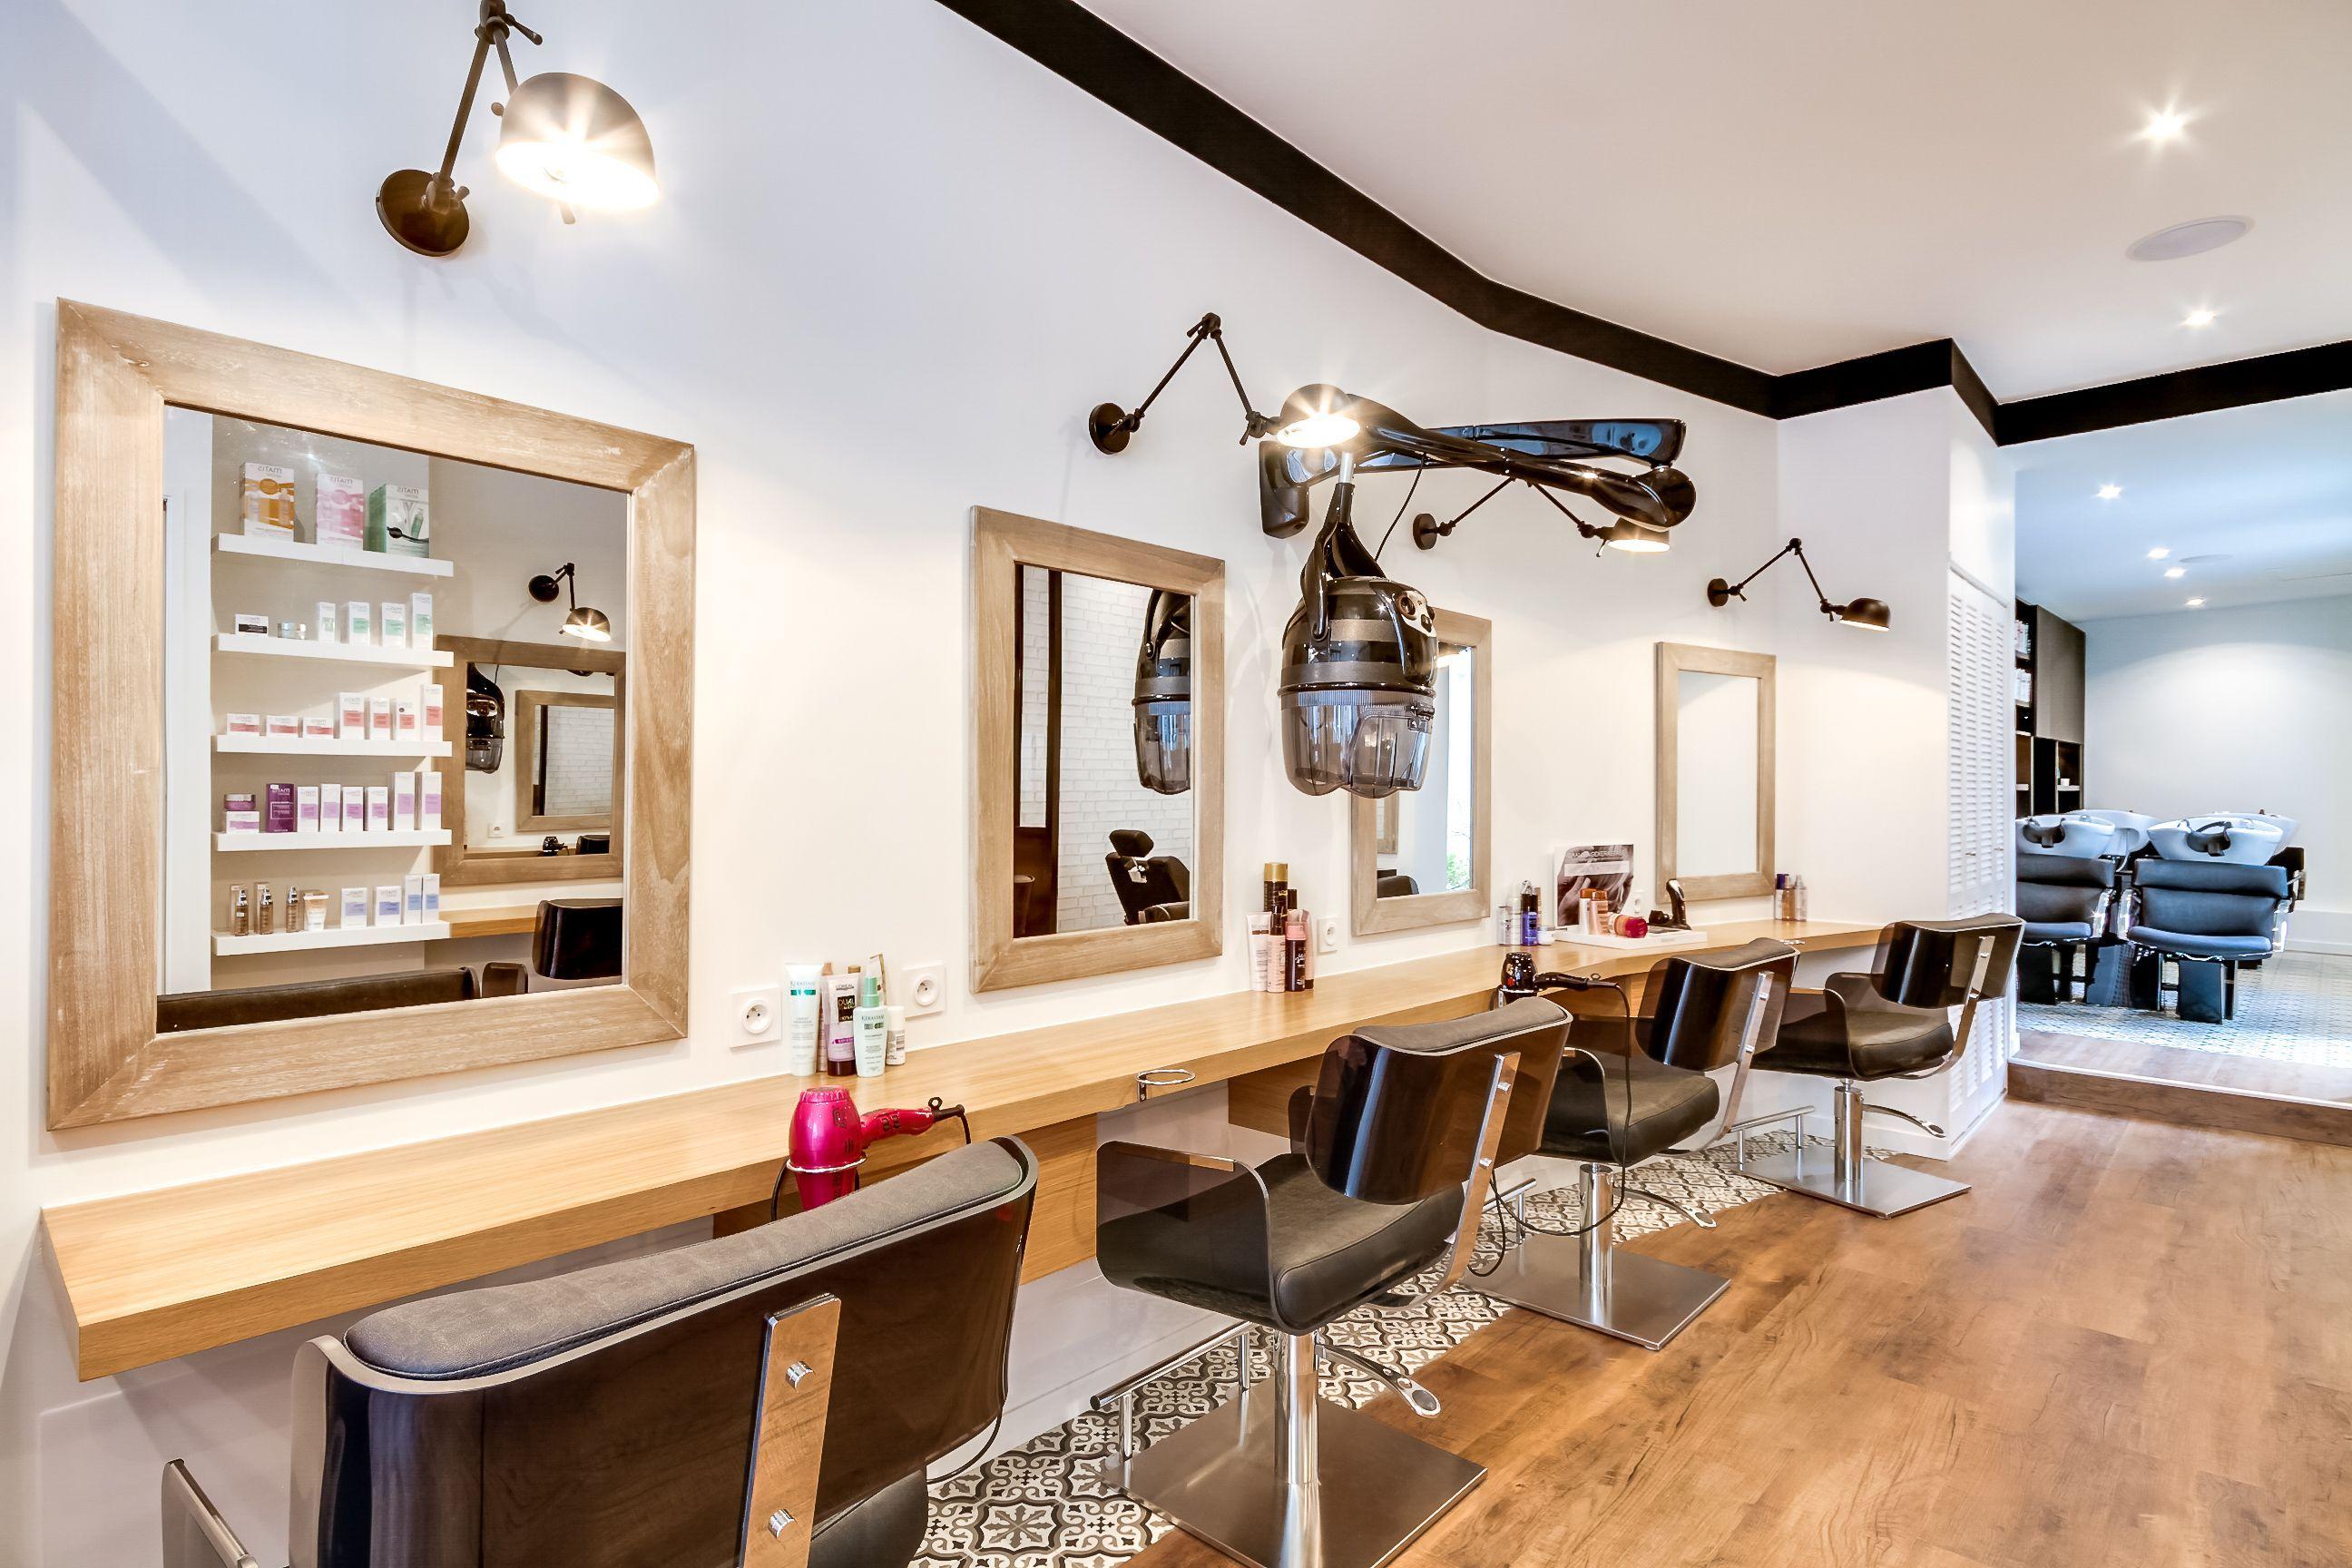 Le Petit Salon Coiffeur Paris in 20  Salon interior design